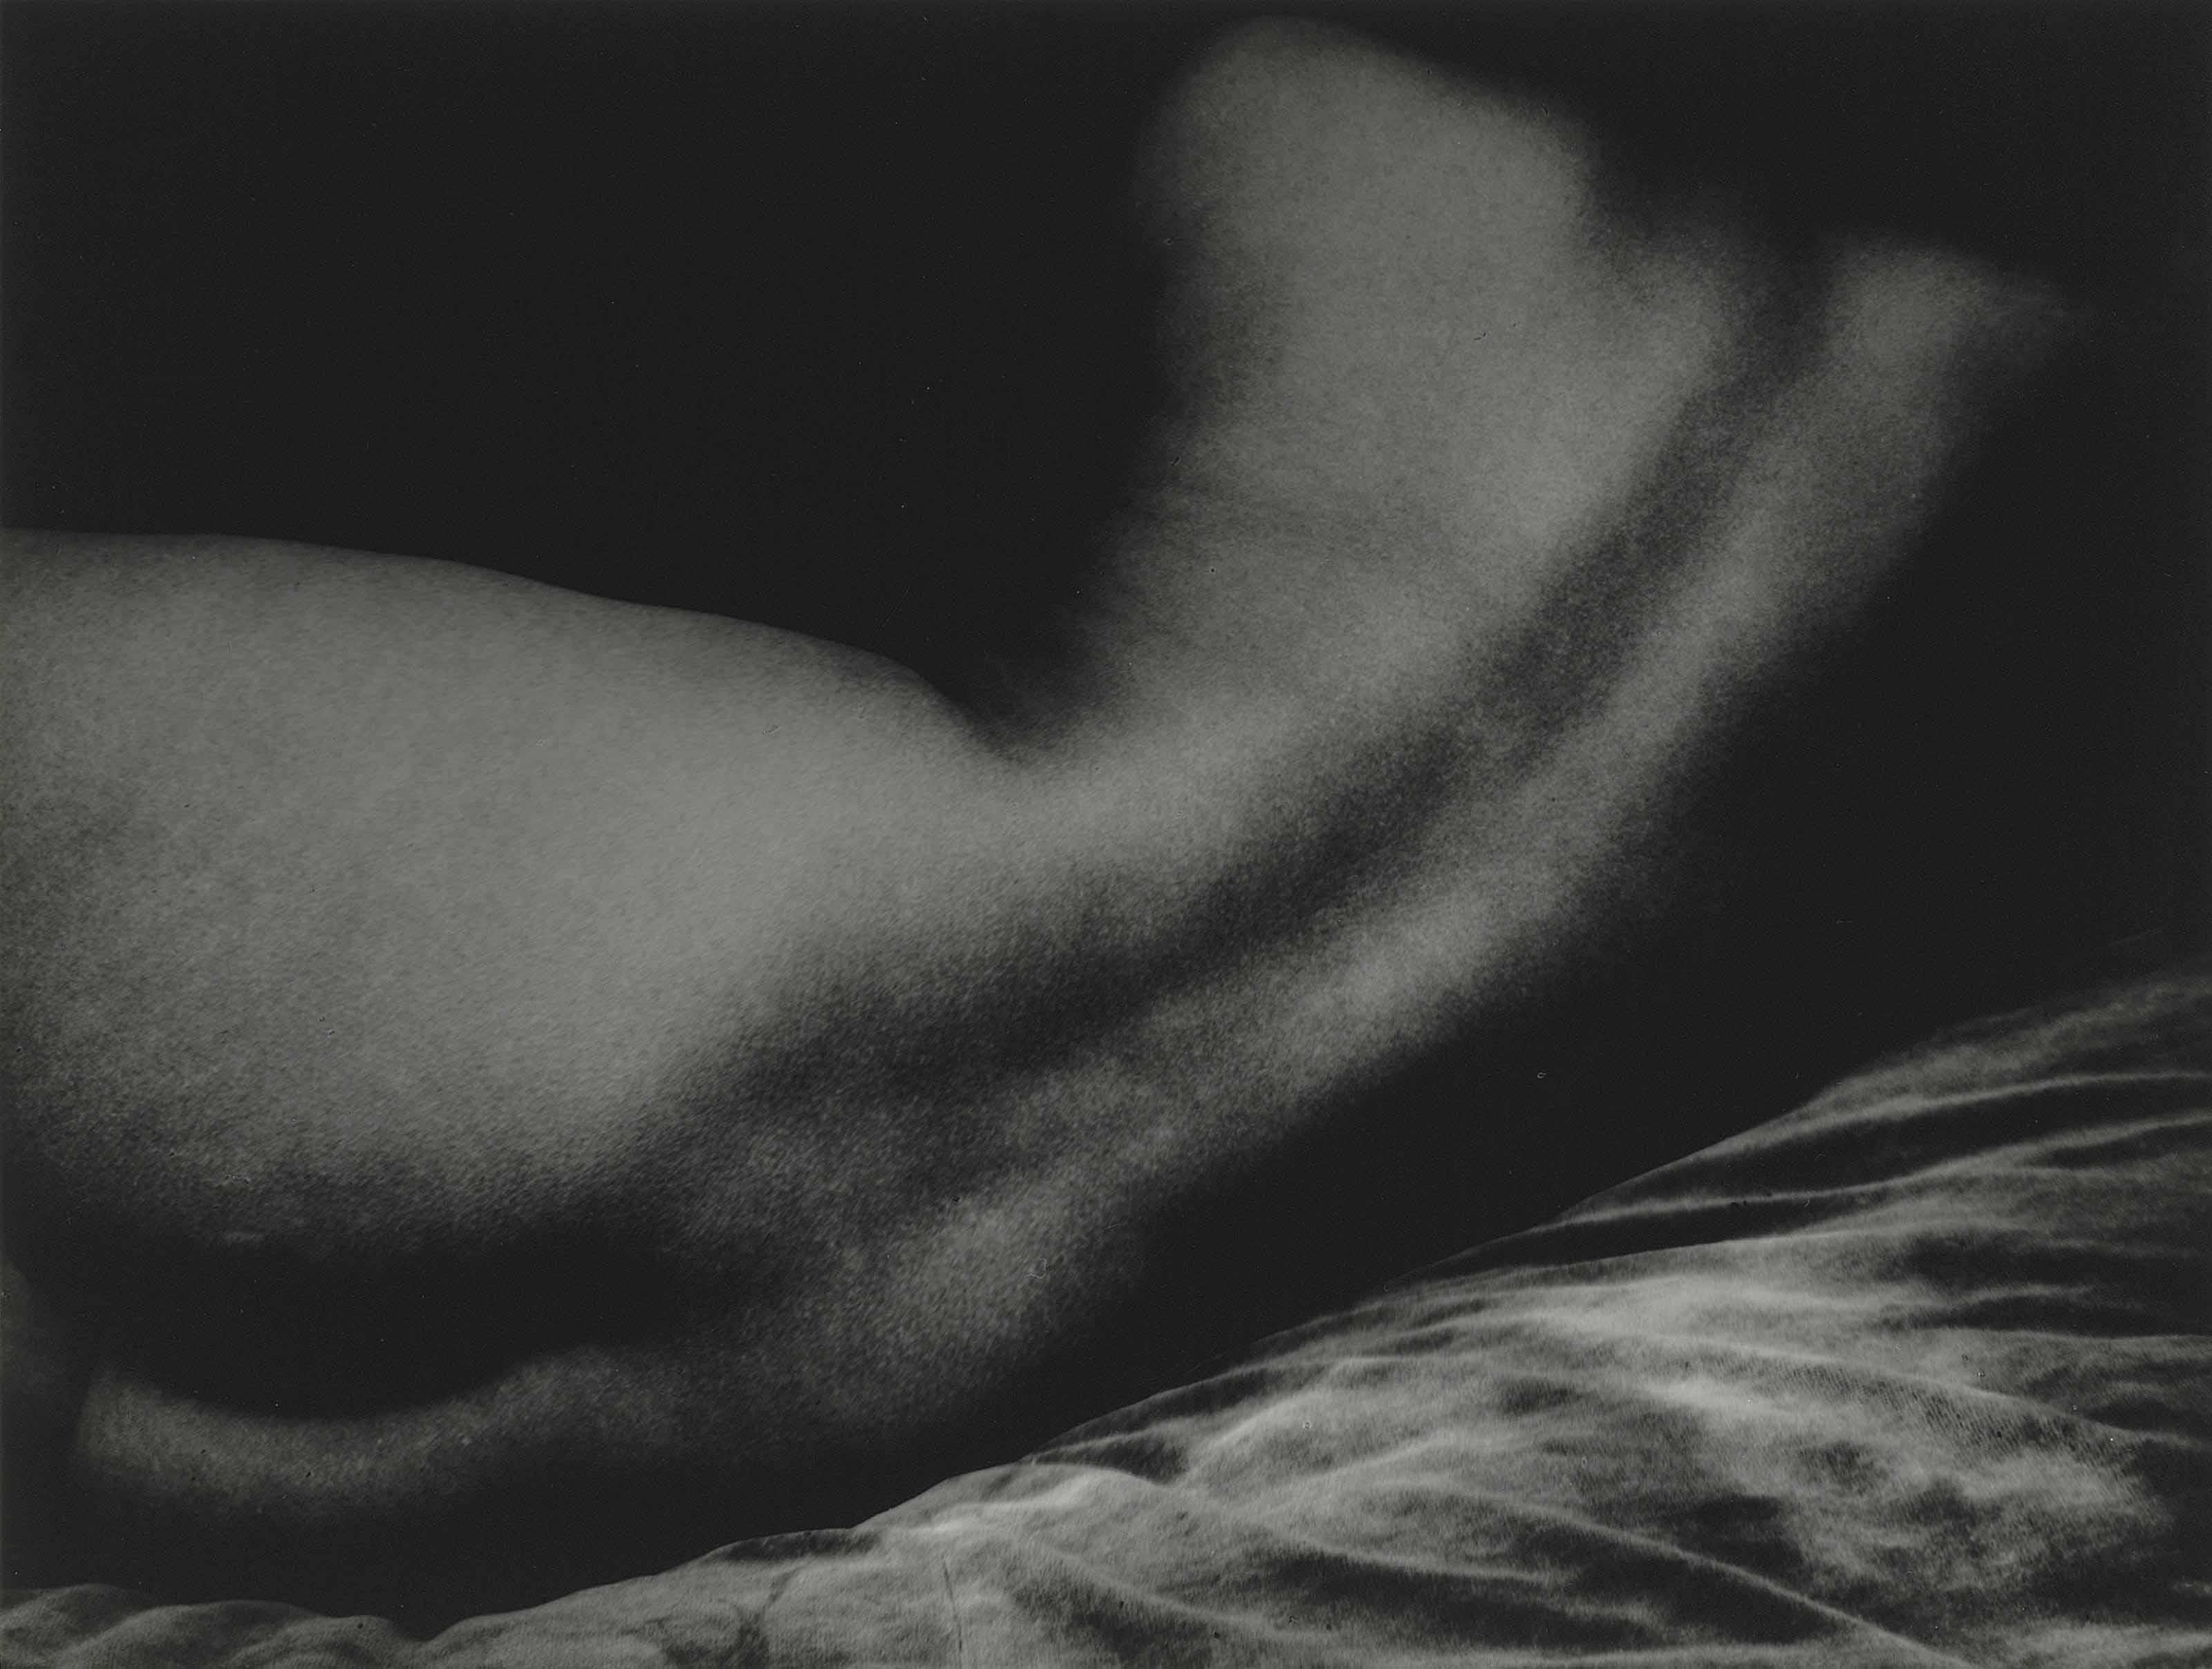 Nude studies, c. 1960